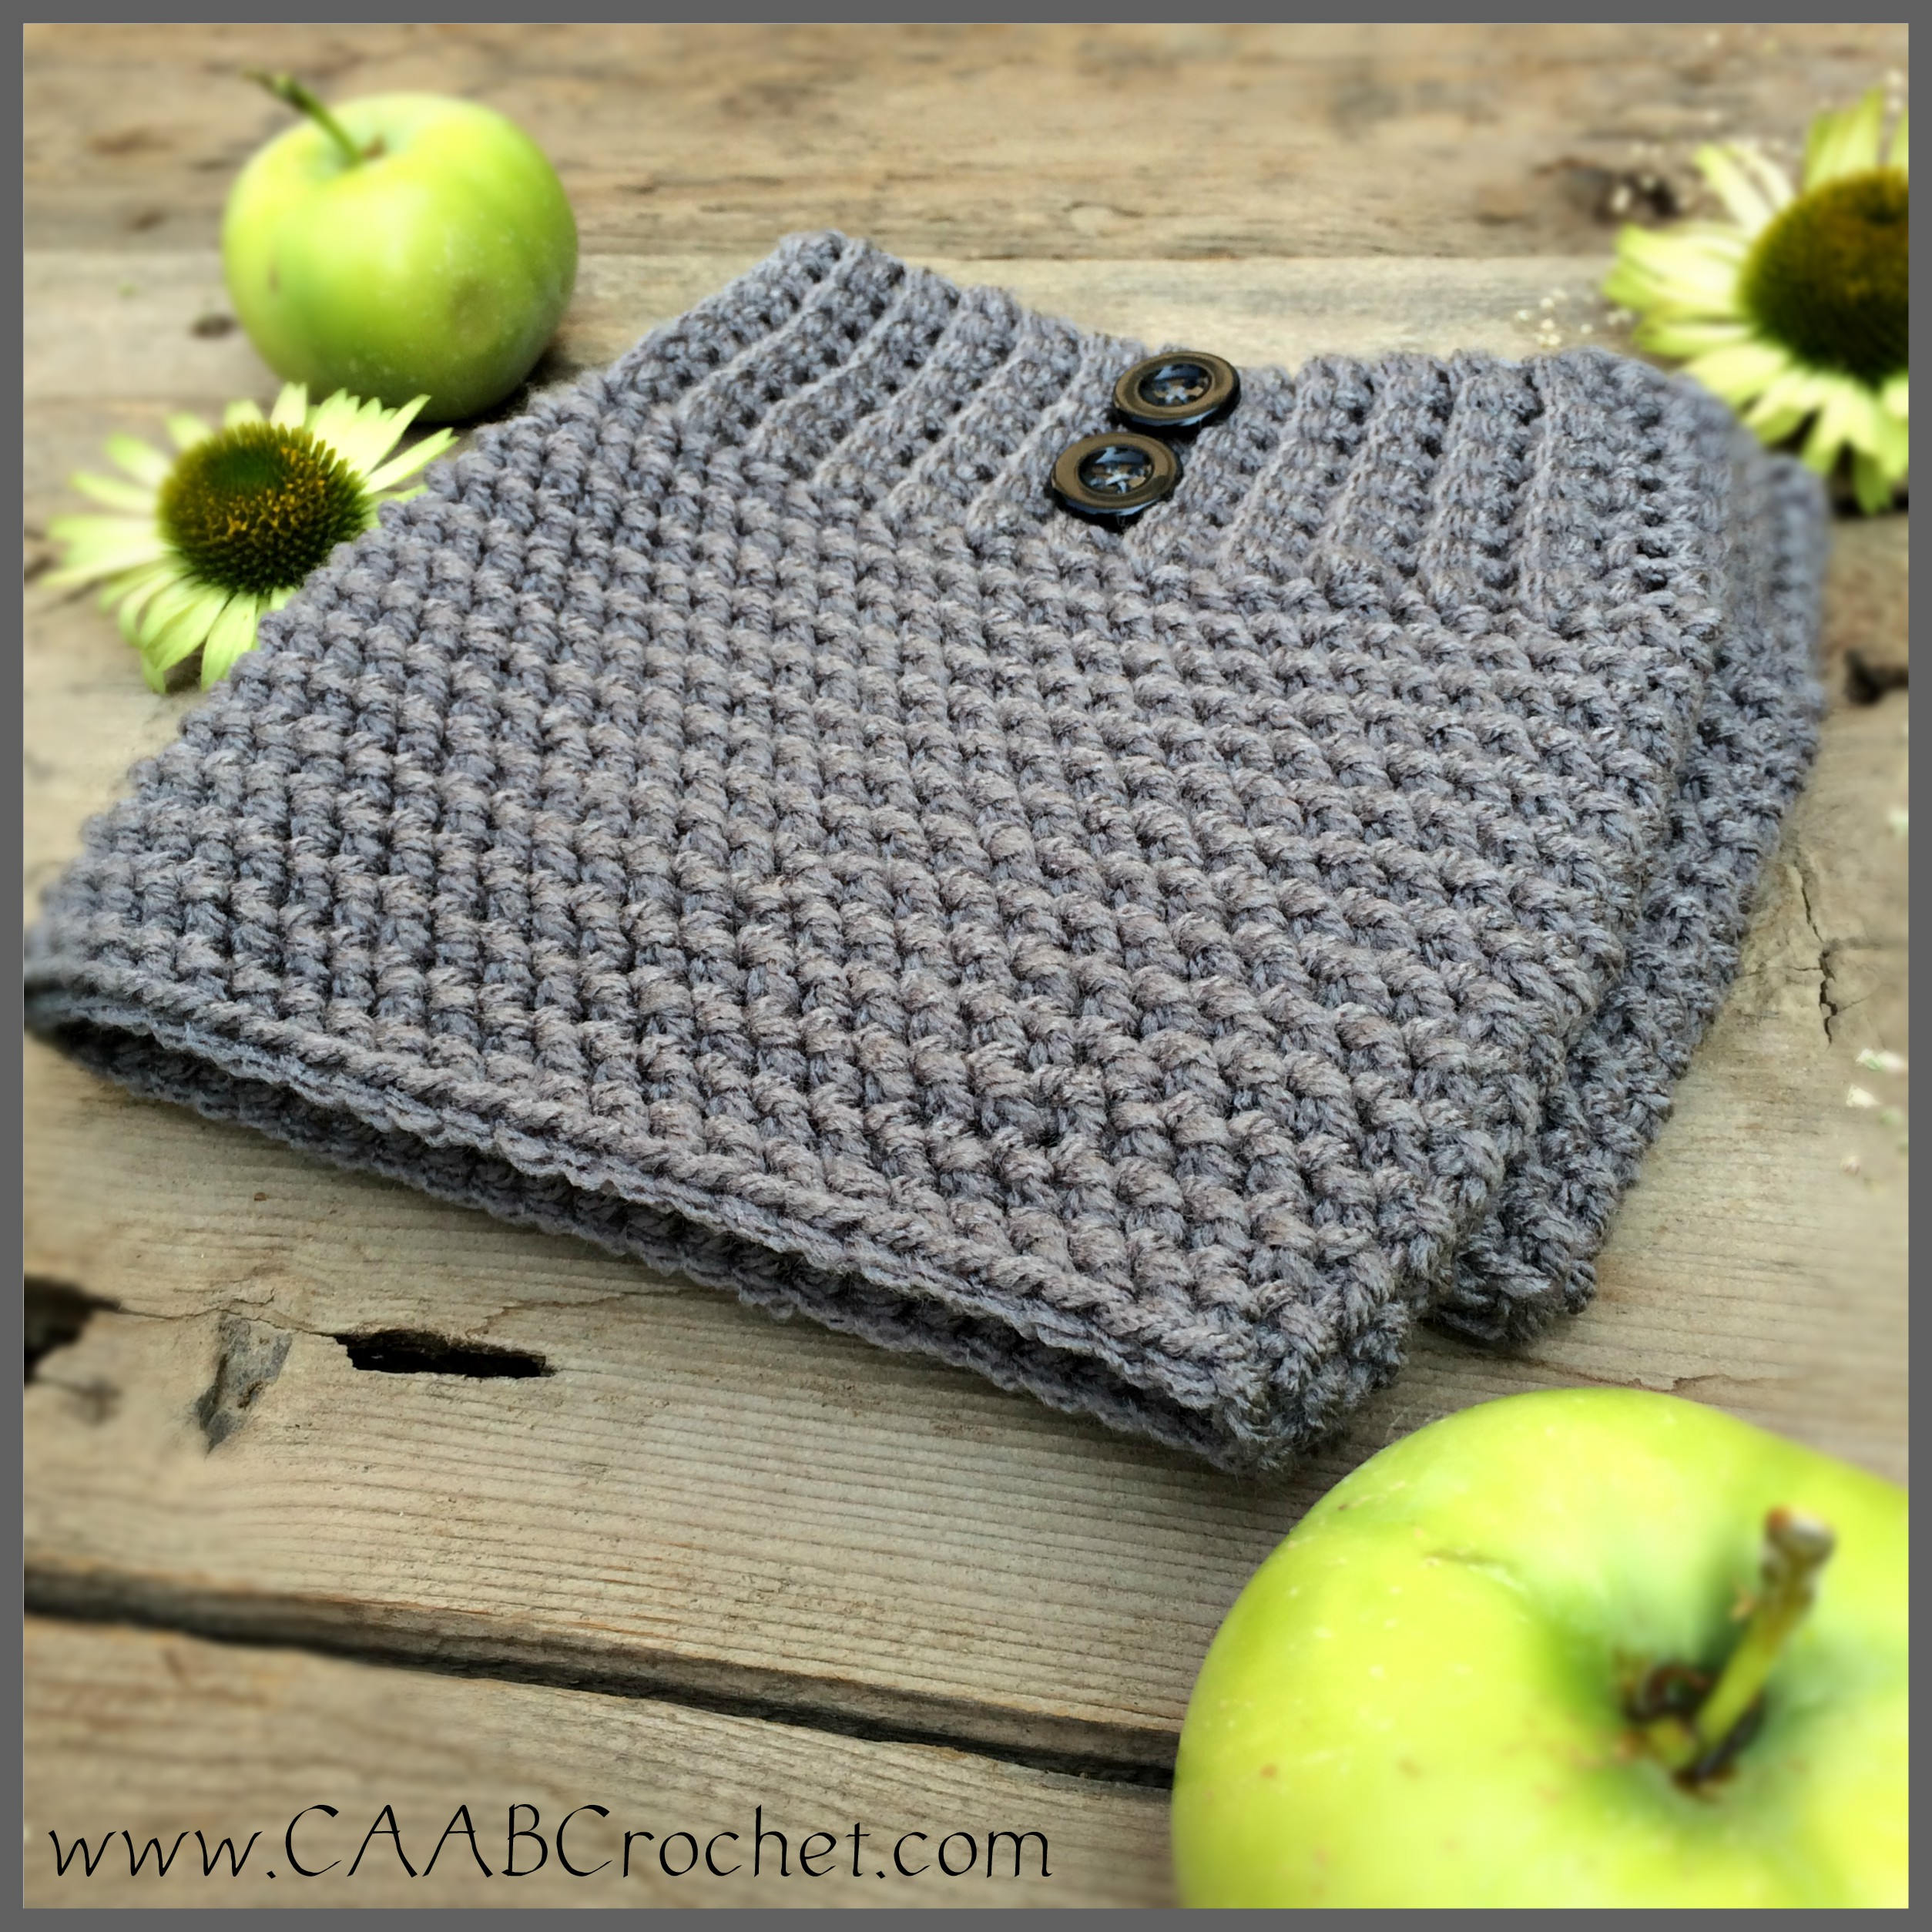 Herringbone crochet boot cuff pattern 4 cute as a button crochet herringbone crochet boot cuff pattern 4 dt1010fo